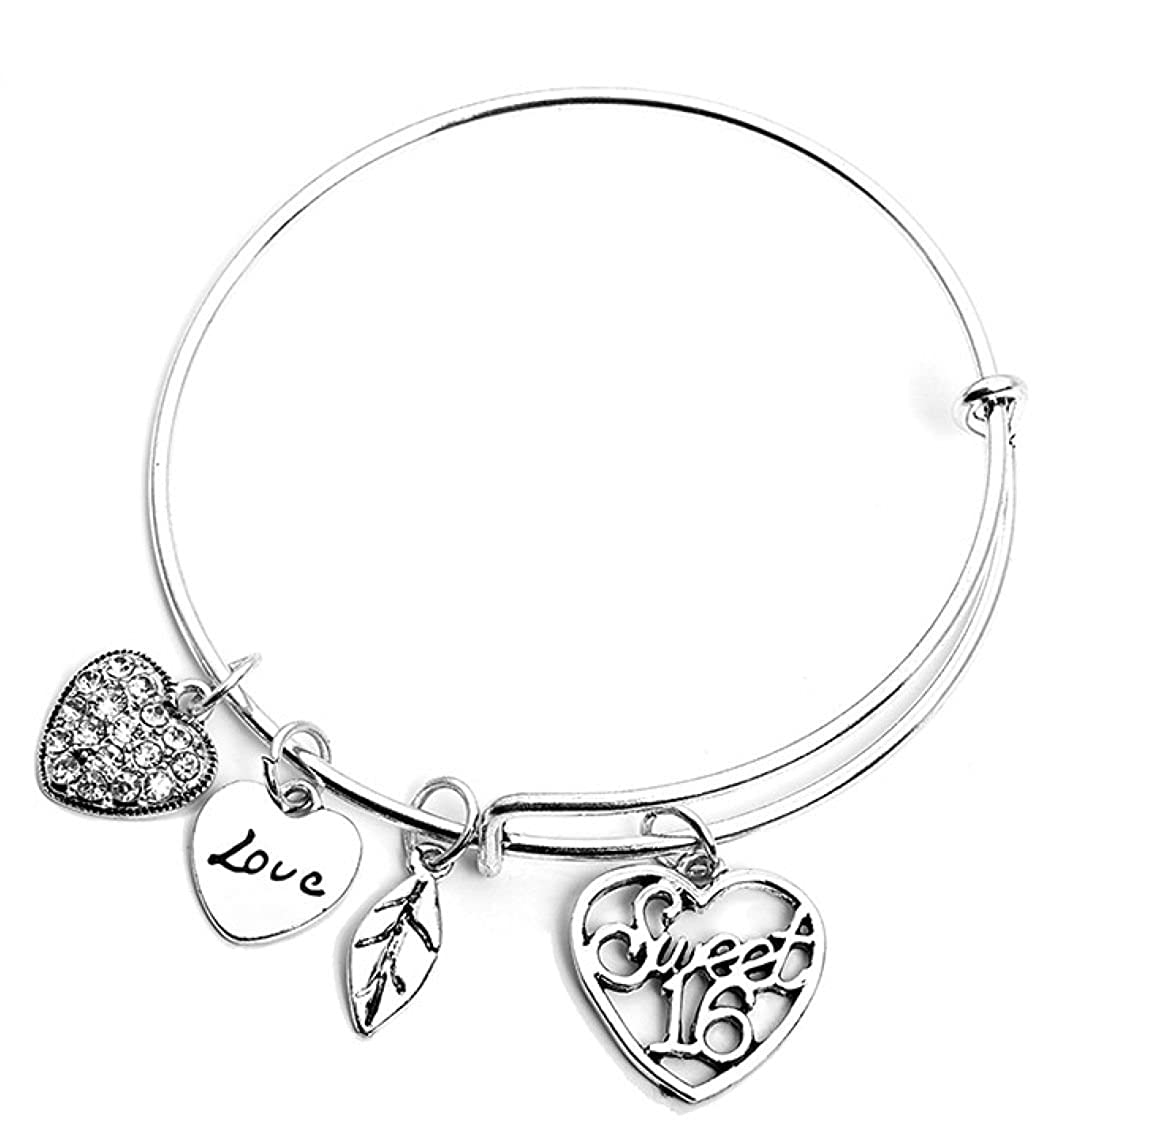 dc6185142 Amazon.com: Infinity Collection Sweet 16 Charm Bangle Bracelet- Sweet 16  Jewelry - Sweet Sixteen Gift for Girls: Jewelry